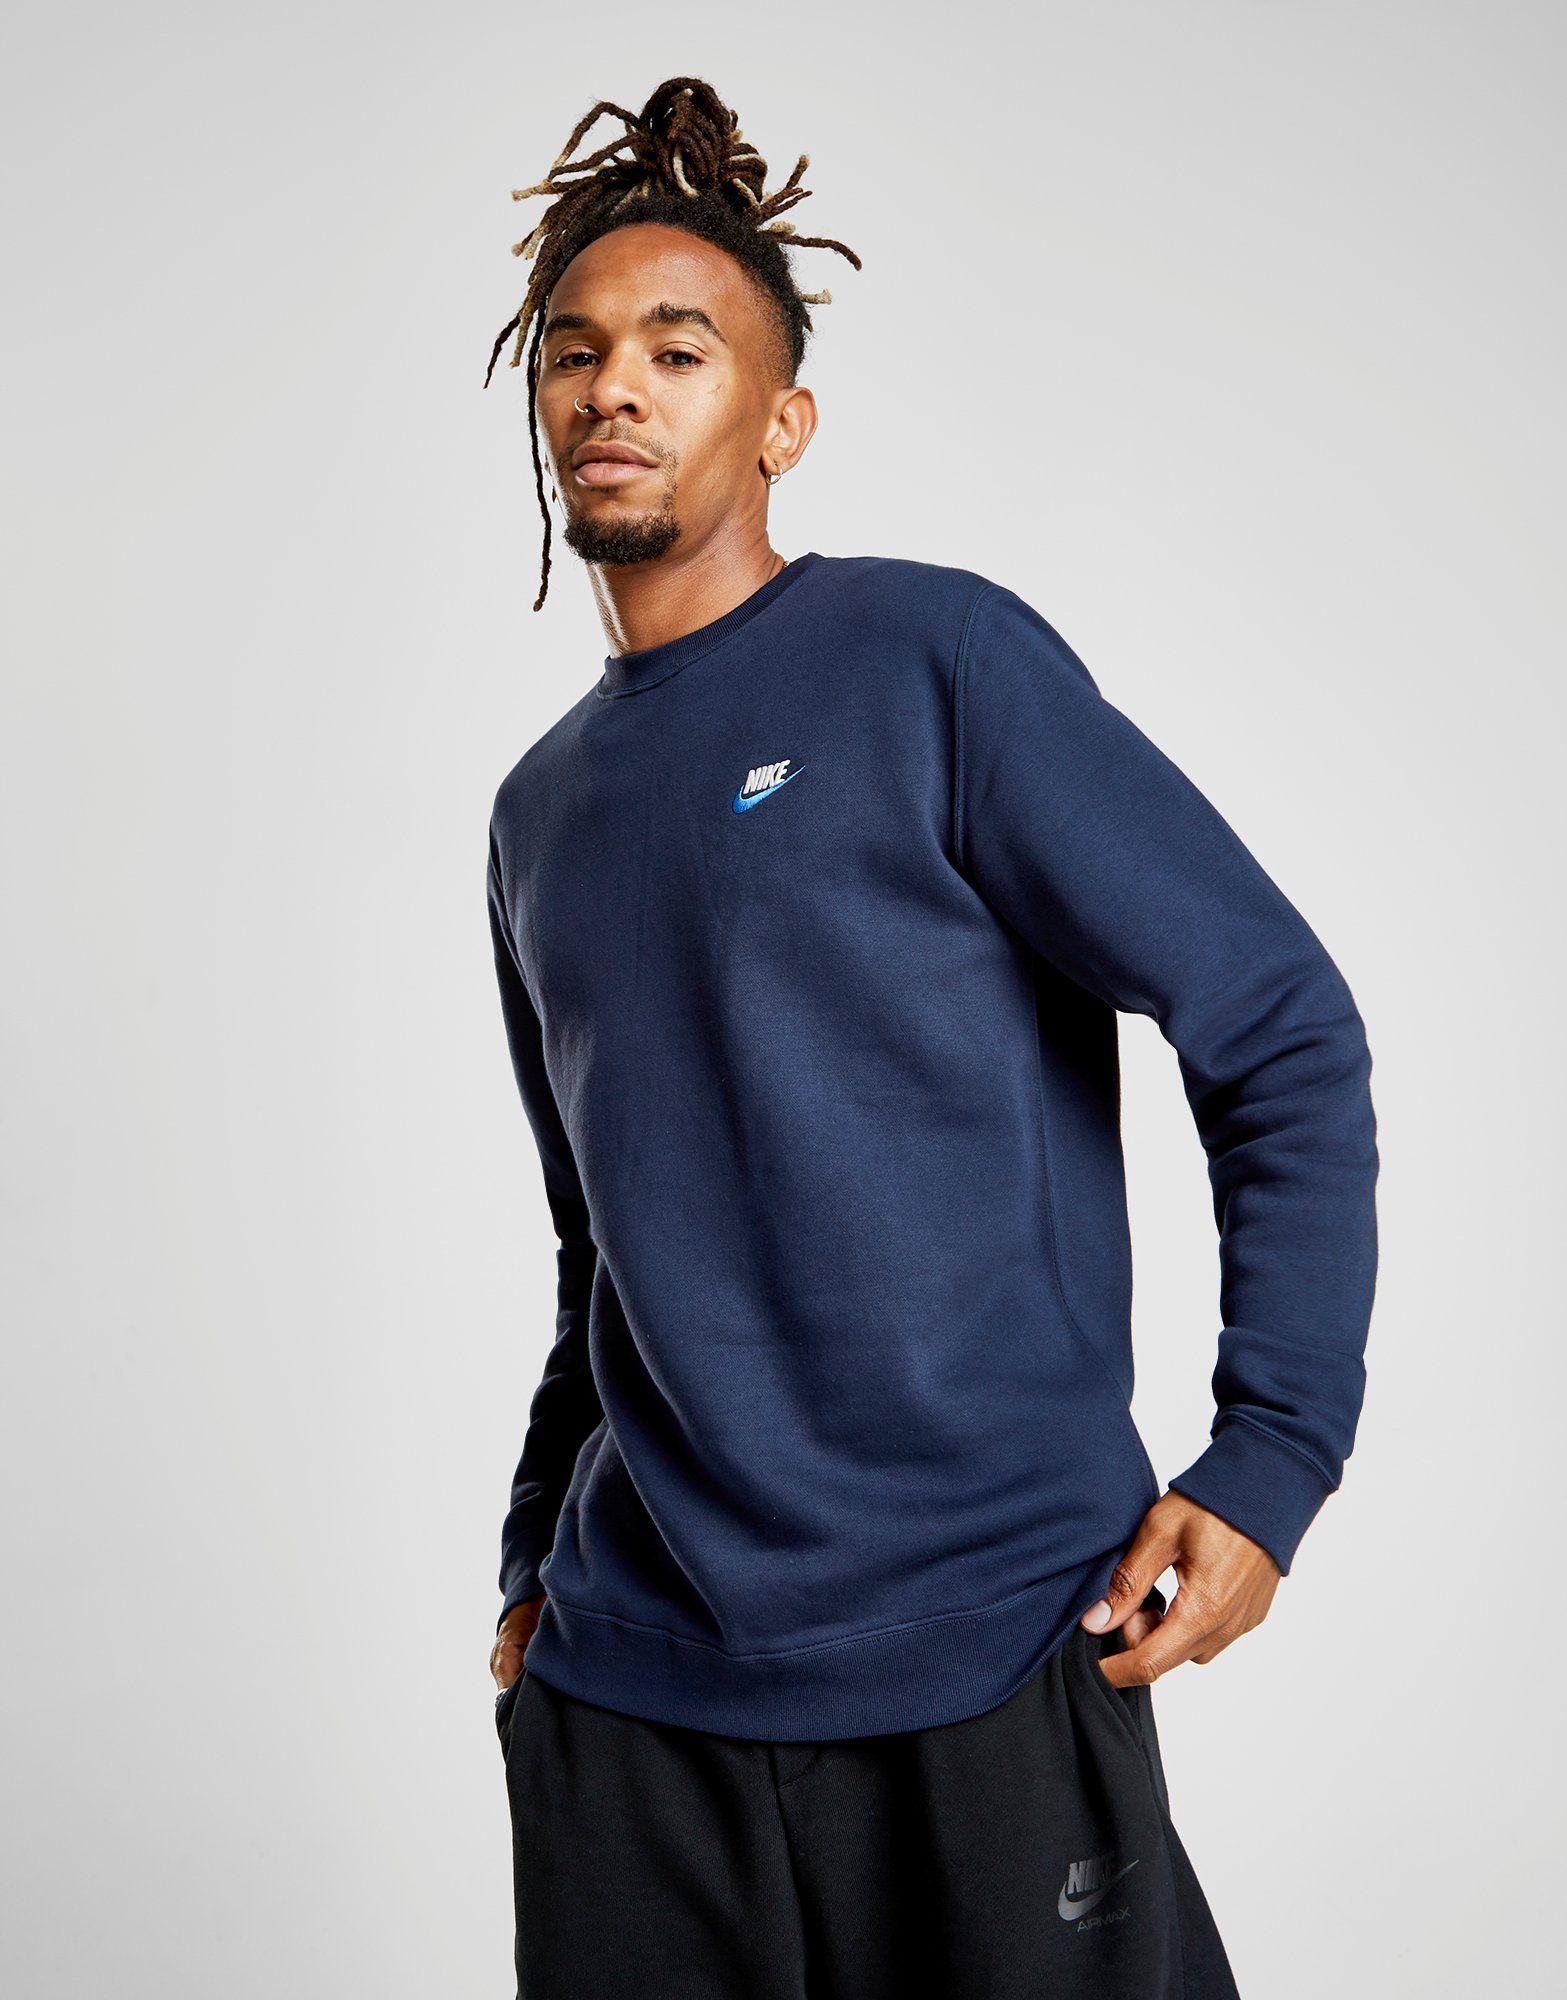 ala femenino polilla  Nike Foundation Crew Sweatshirt – Achète en ligne Nike Foundation Crew  Sweatshirt avec JD Sports, le leader du Sport Fash… | Streetwear, Vêtements  homme, Sweatshirt